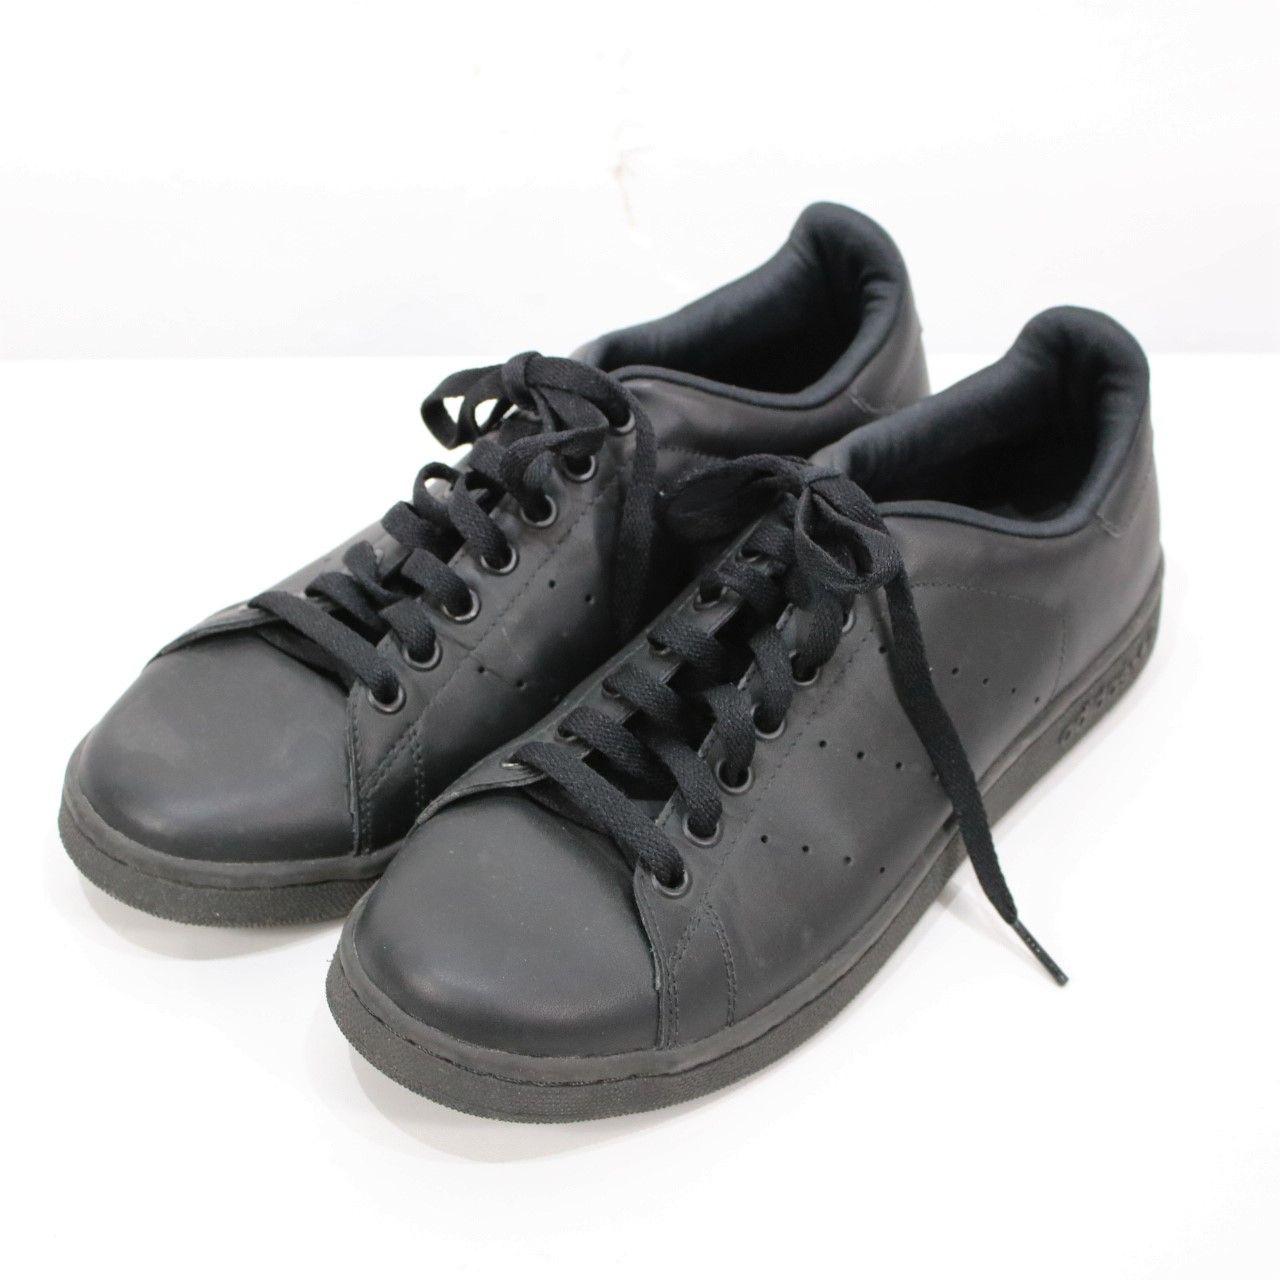 adidas / アディダス | STAN SMITH 2 スタンスミス2スニーカー | 27.0cm | ブラック | メンズ